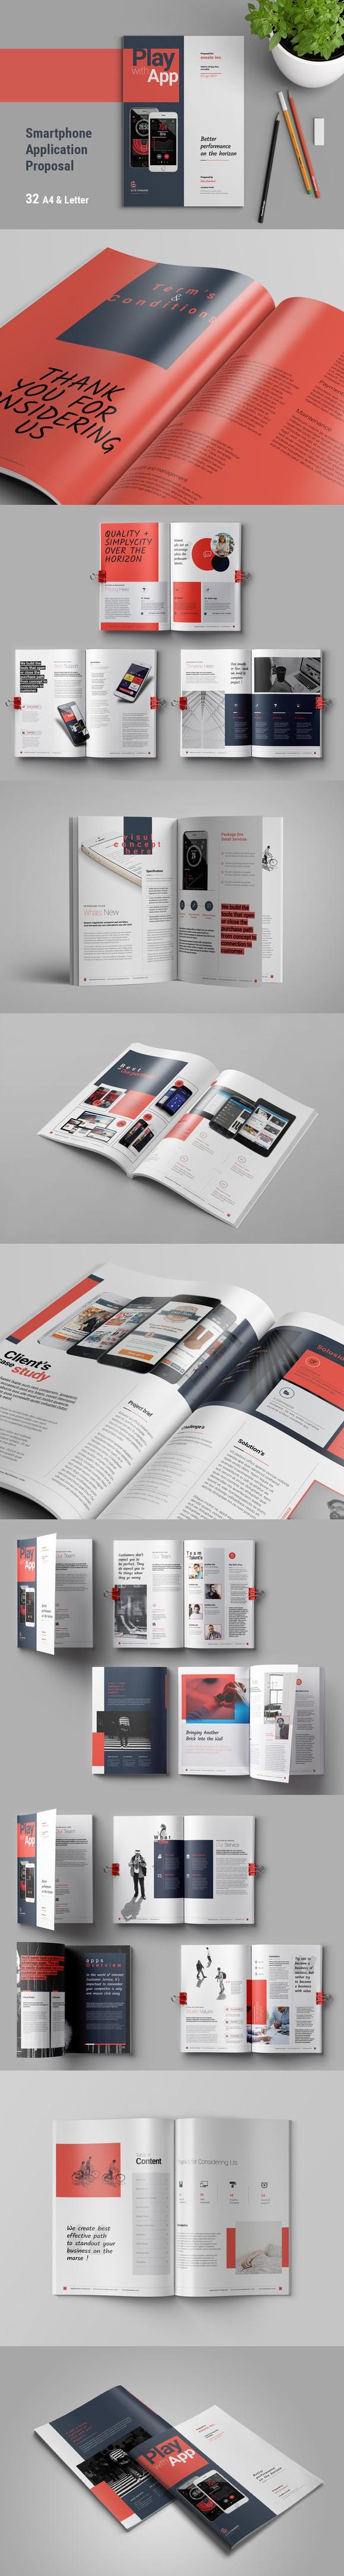 apps proposal brochure templates 16 00 brochure templates